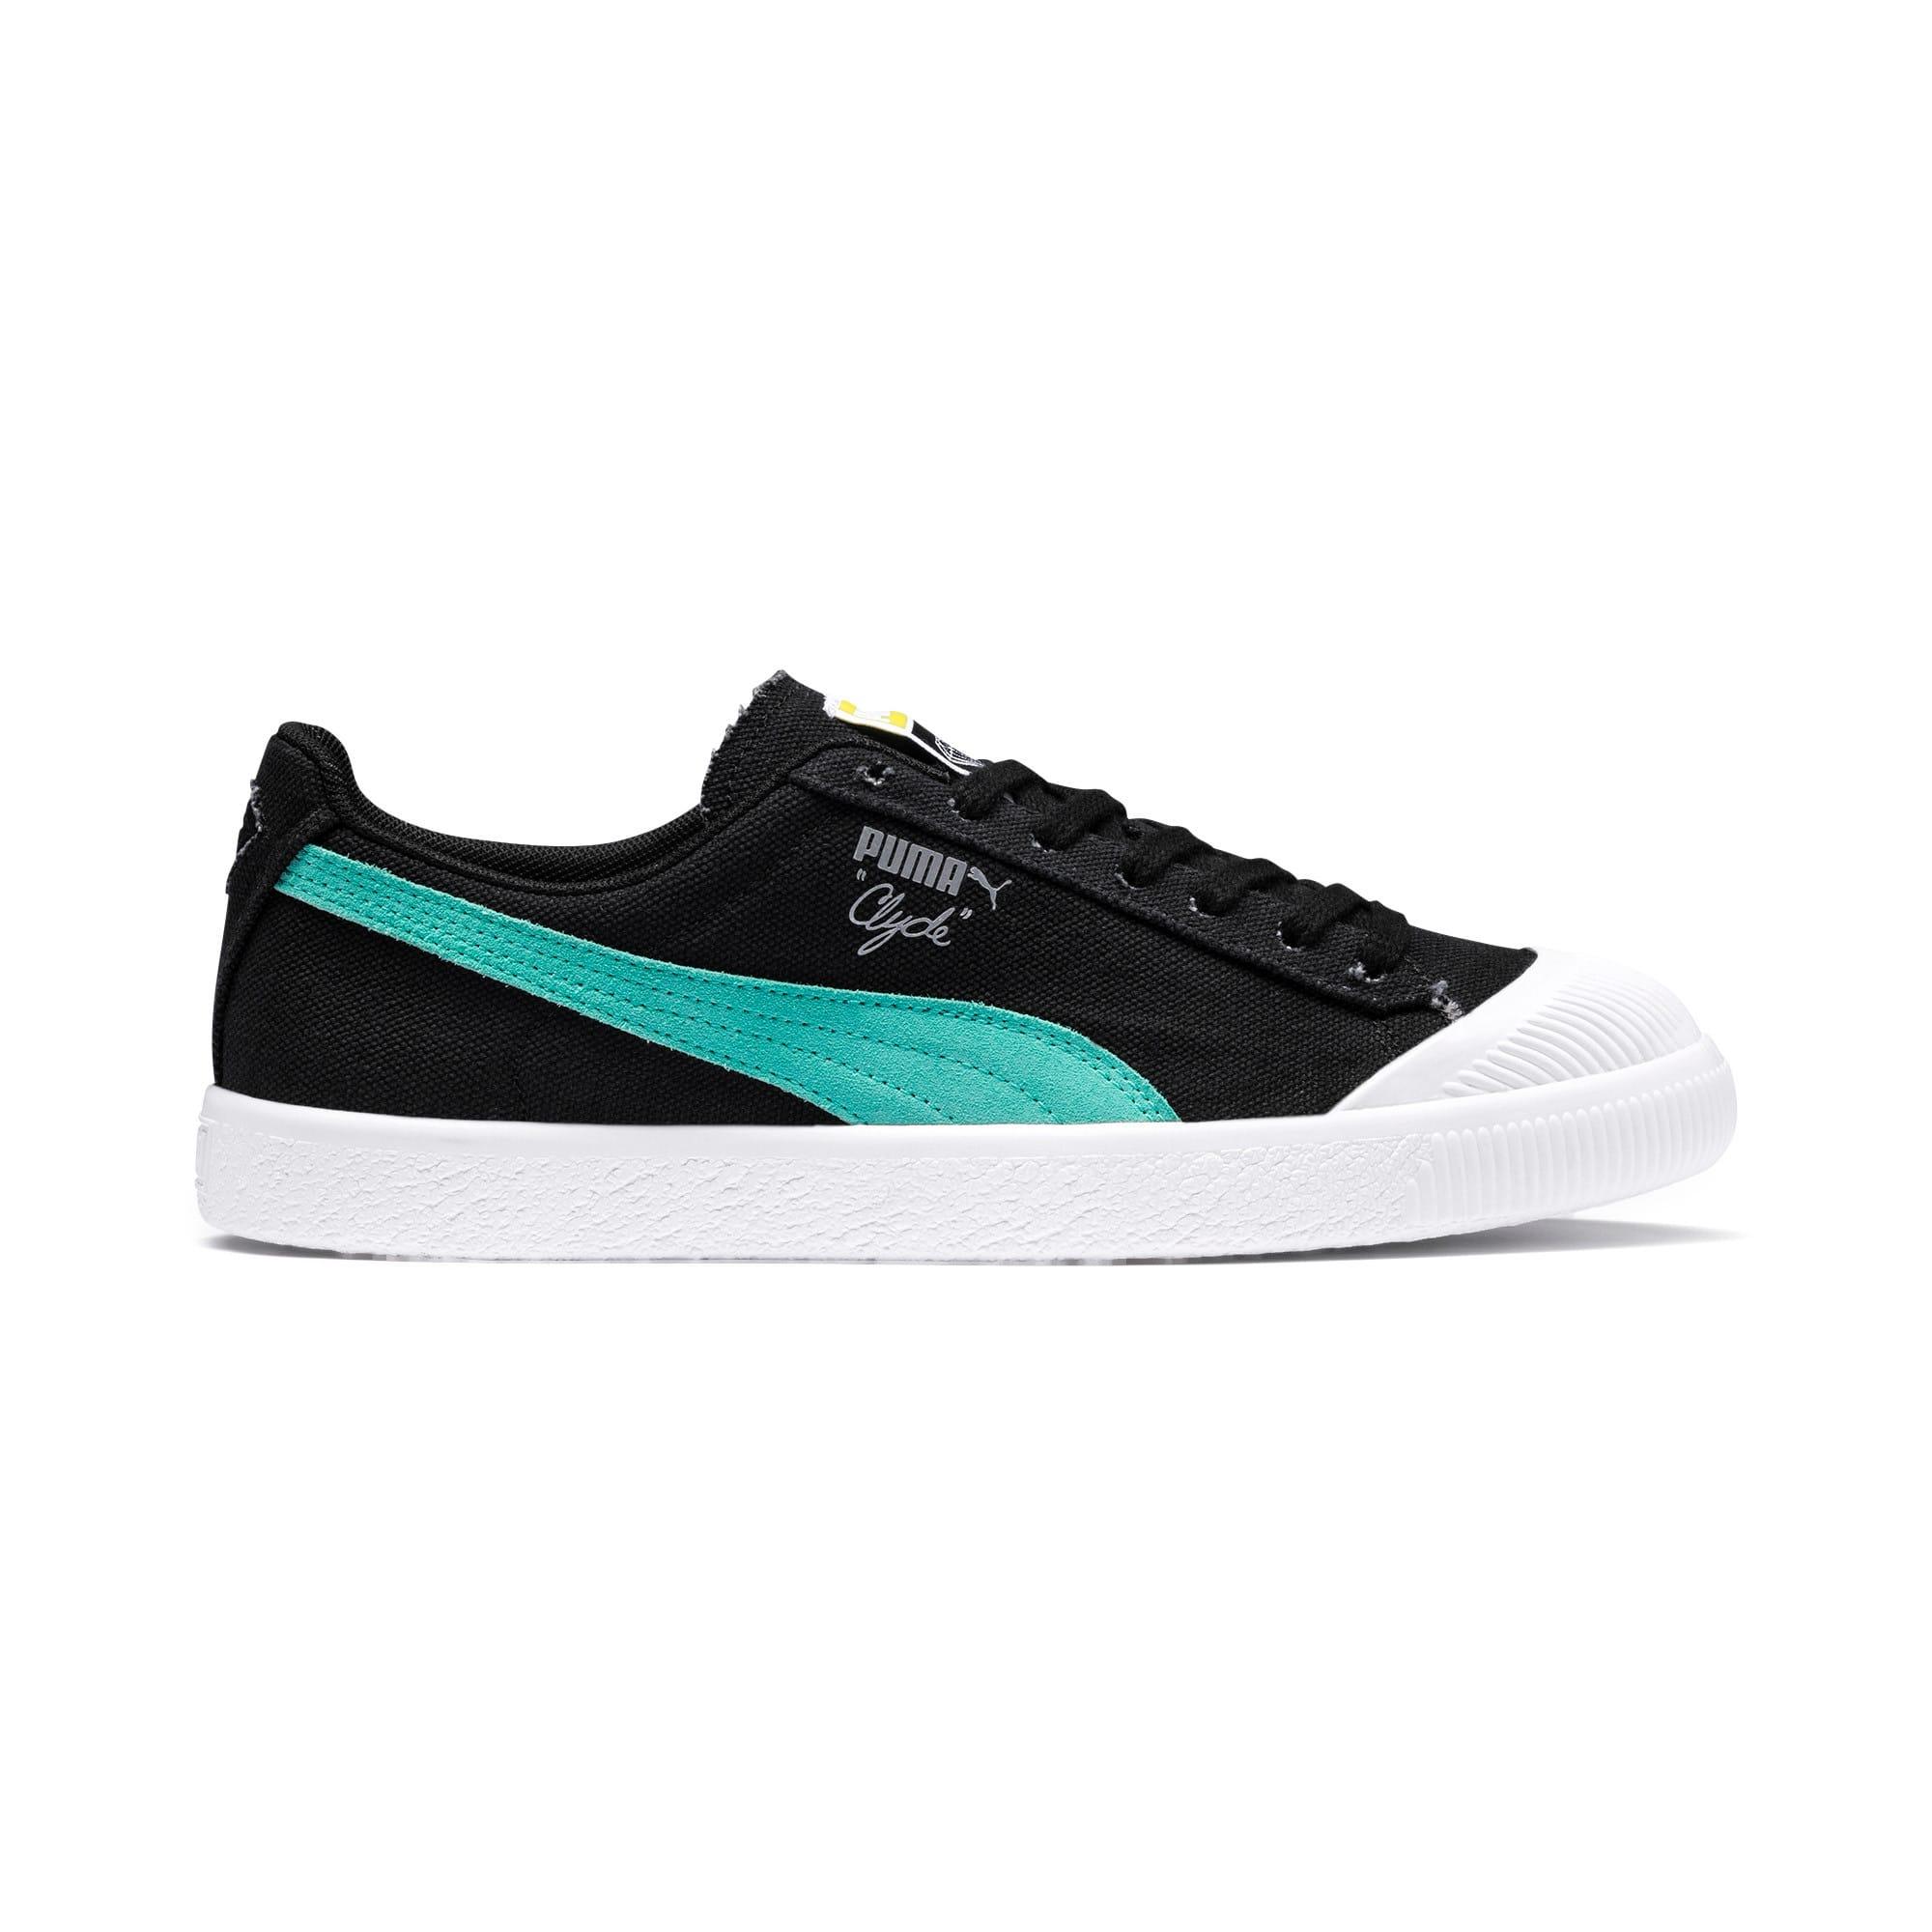 wholesale dealer d6e46 88e41 PUMA x DIAMOND SUPPLY CO. Clyde Sneakers